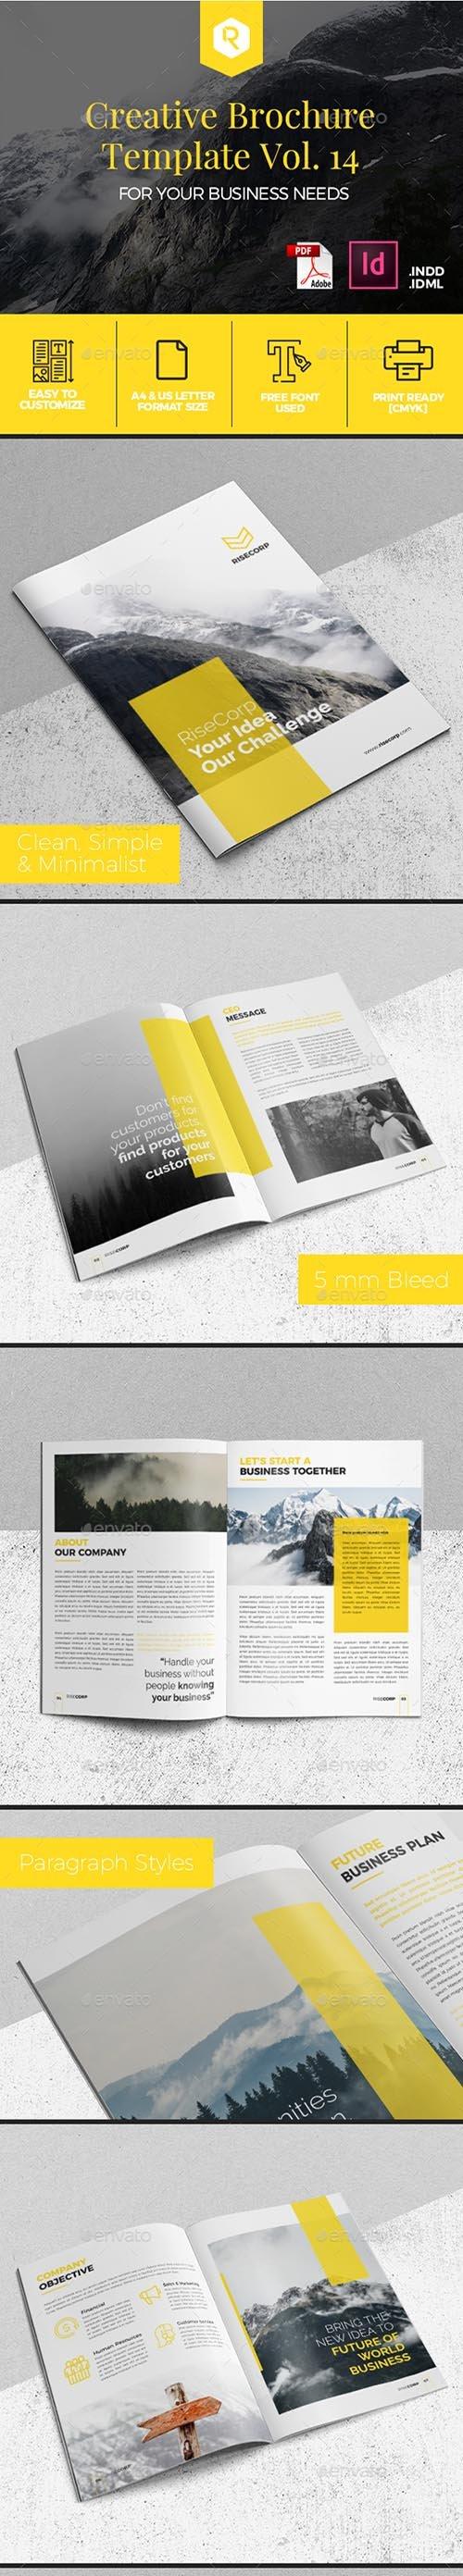 GR - Creative Brochure Template Vol. 14 19979736